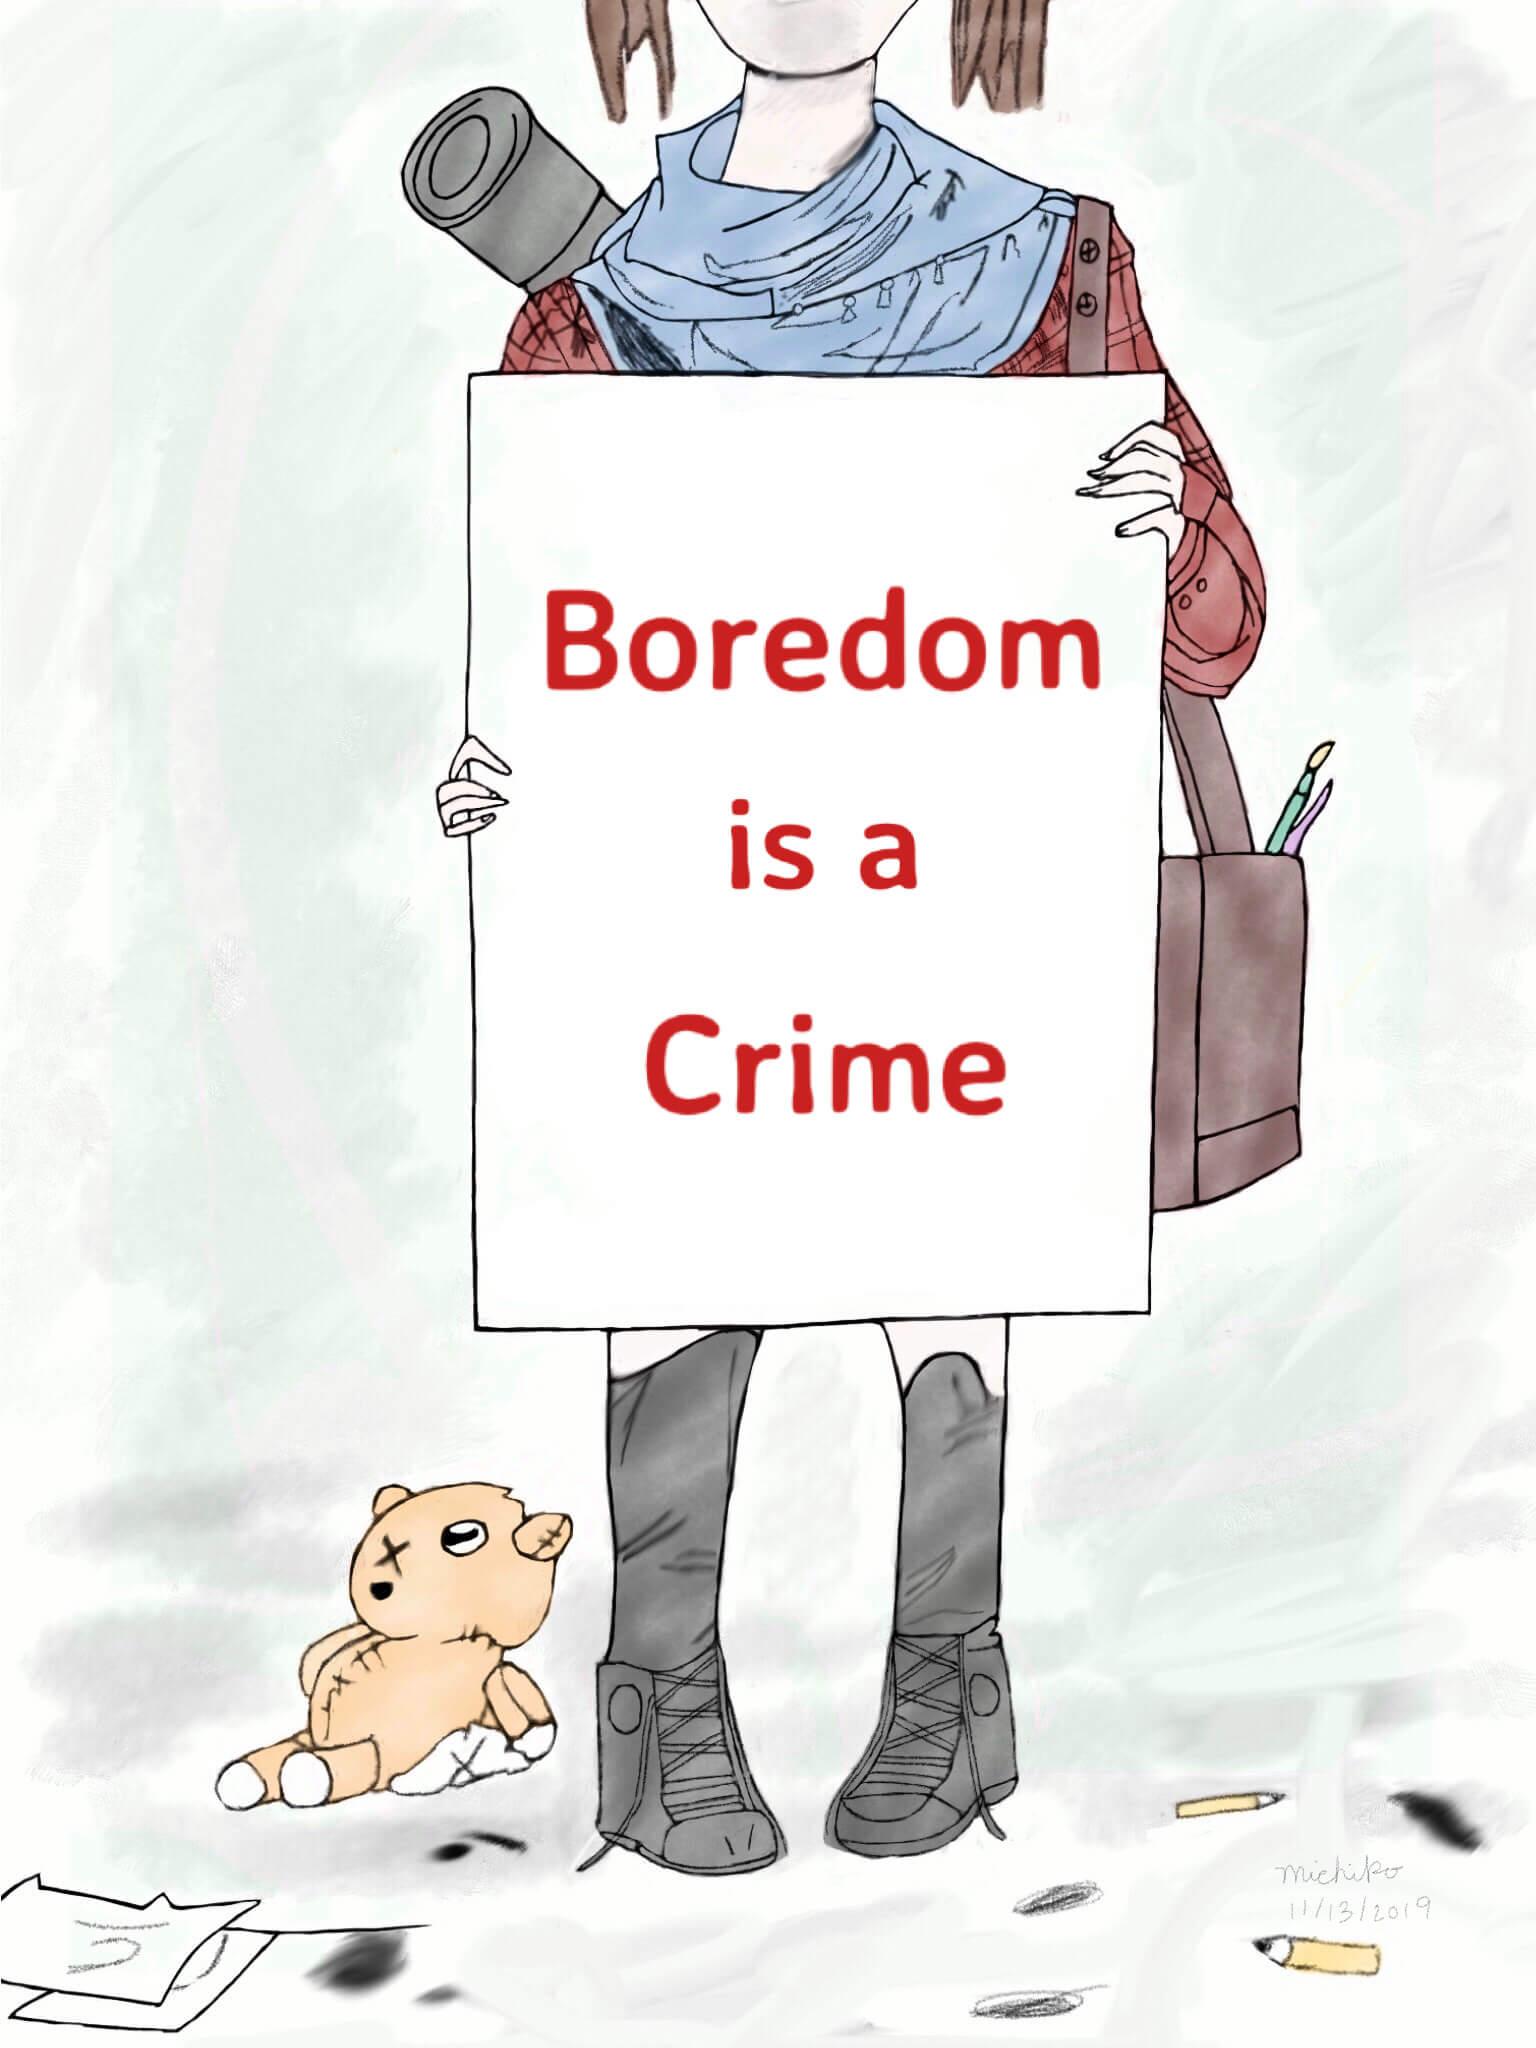 Boredom is a Crime